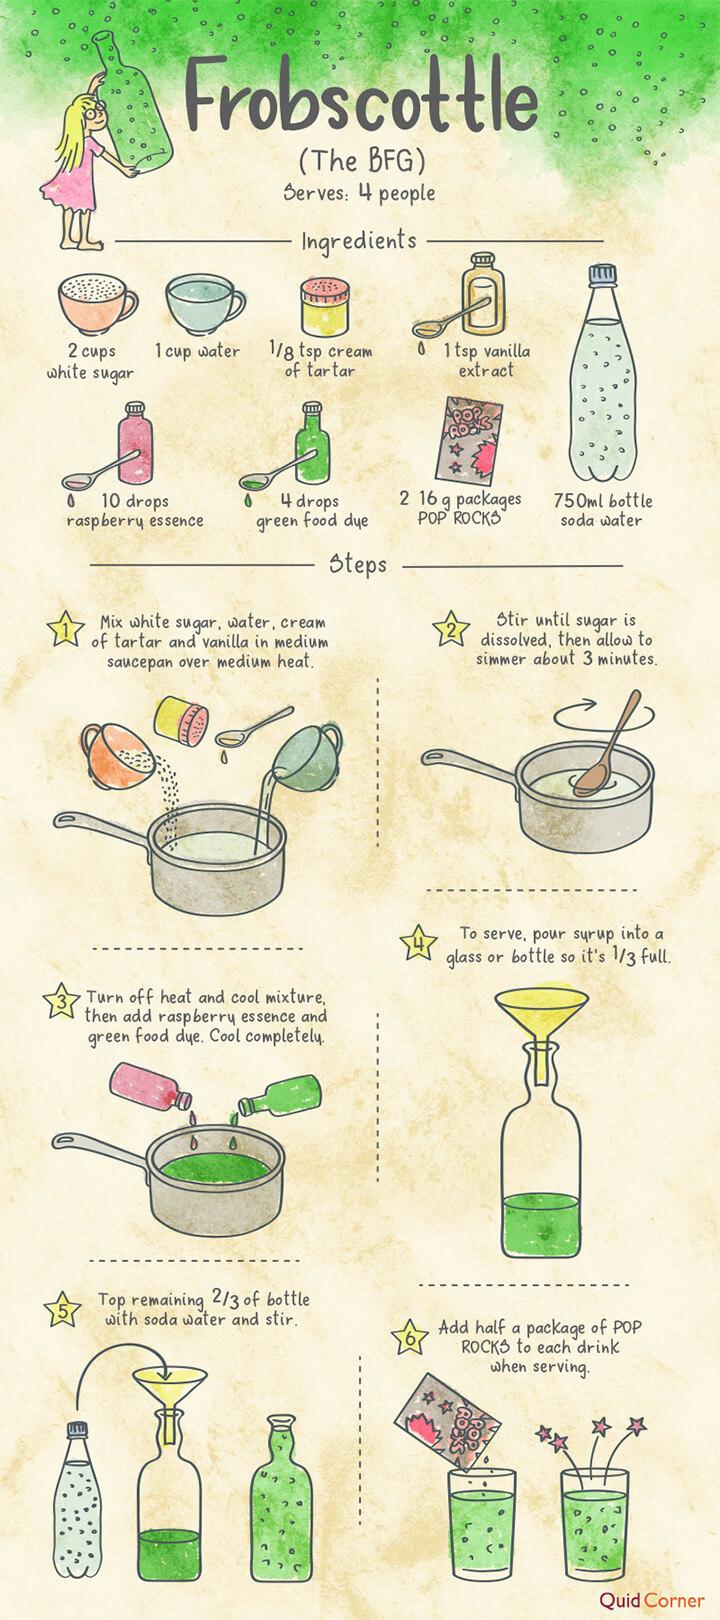 The BFG Frobscottle Recipe